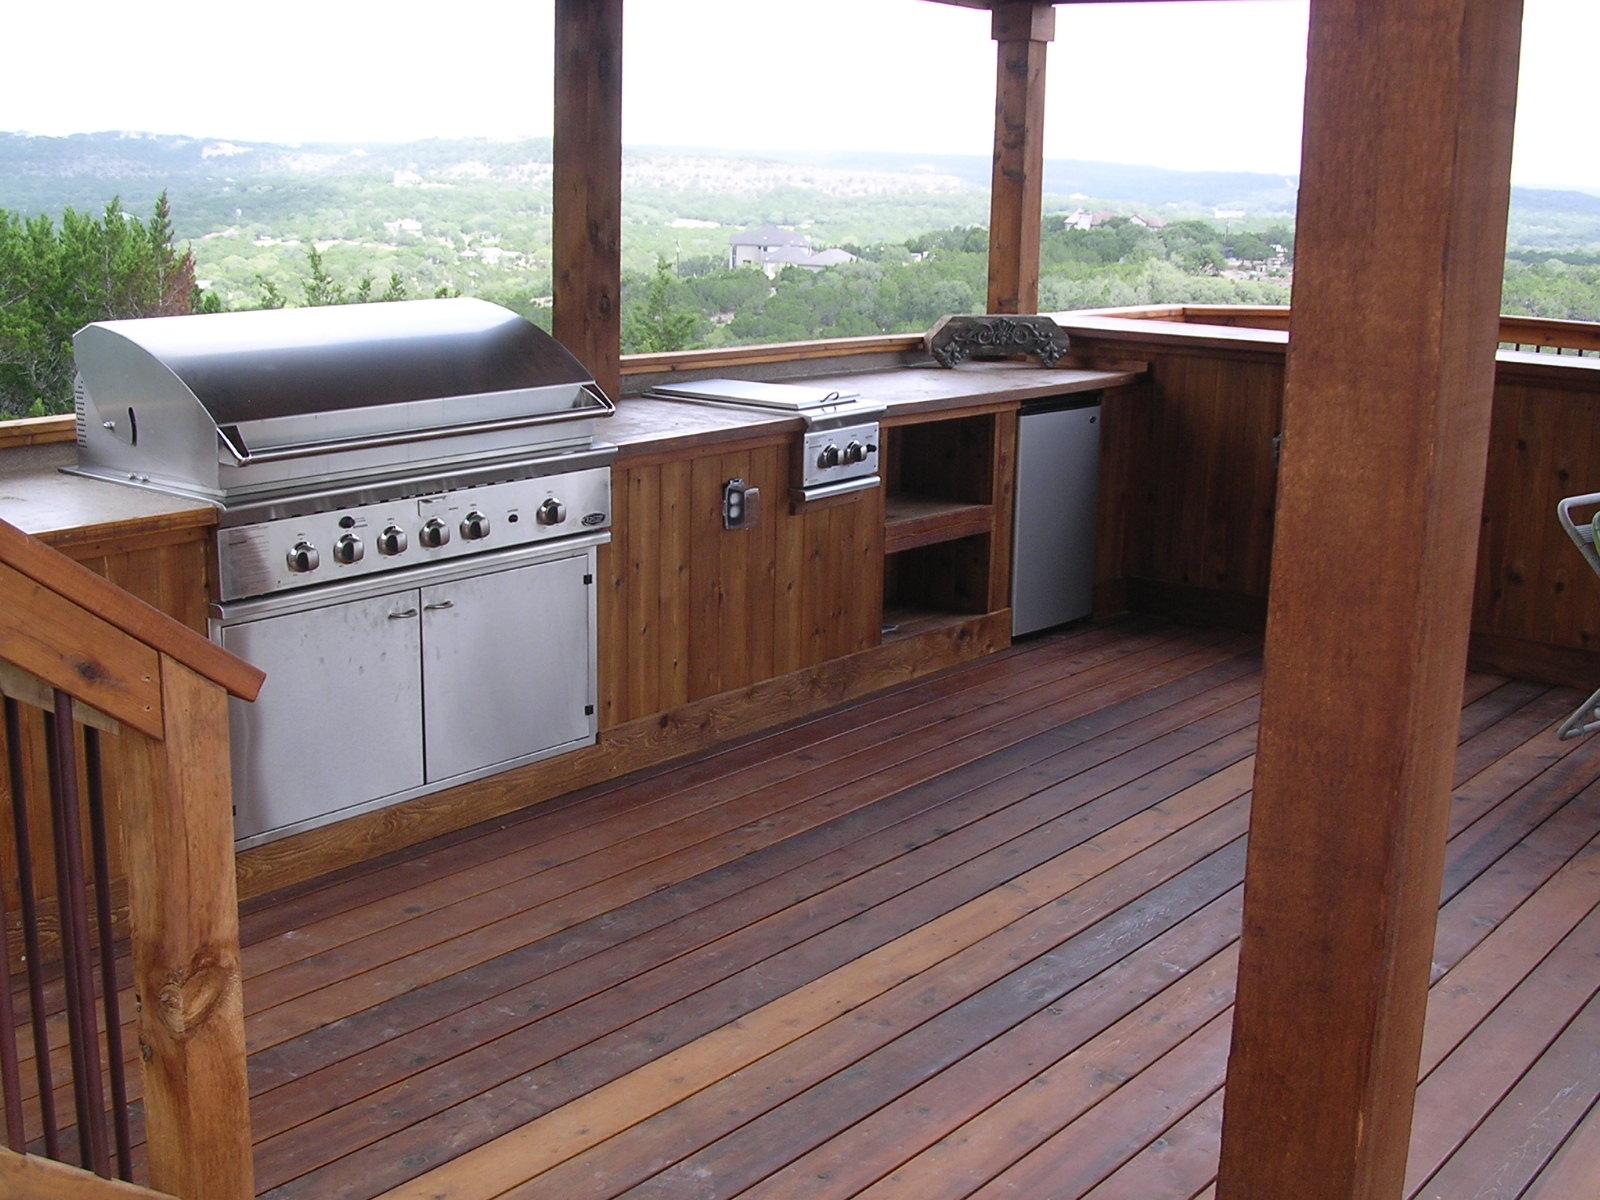 Outdoor Kitchens - Braundera.com on Patio Kitchen id=46660